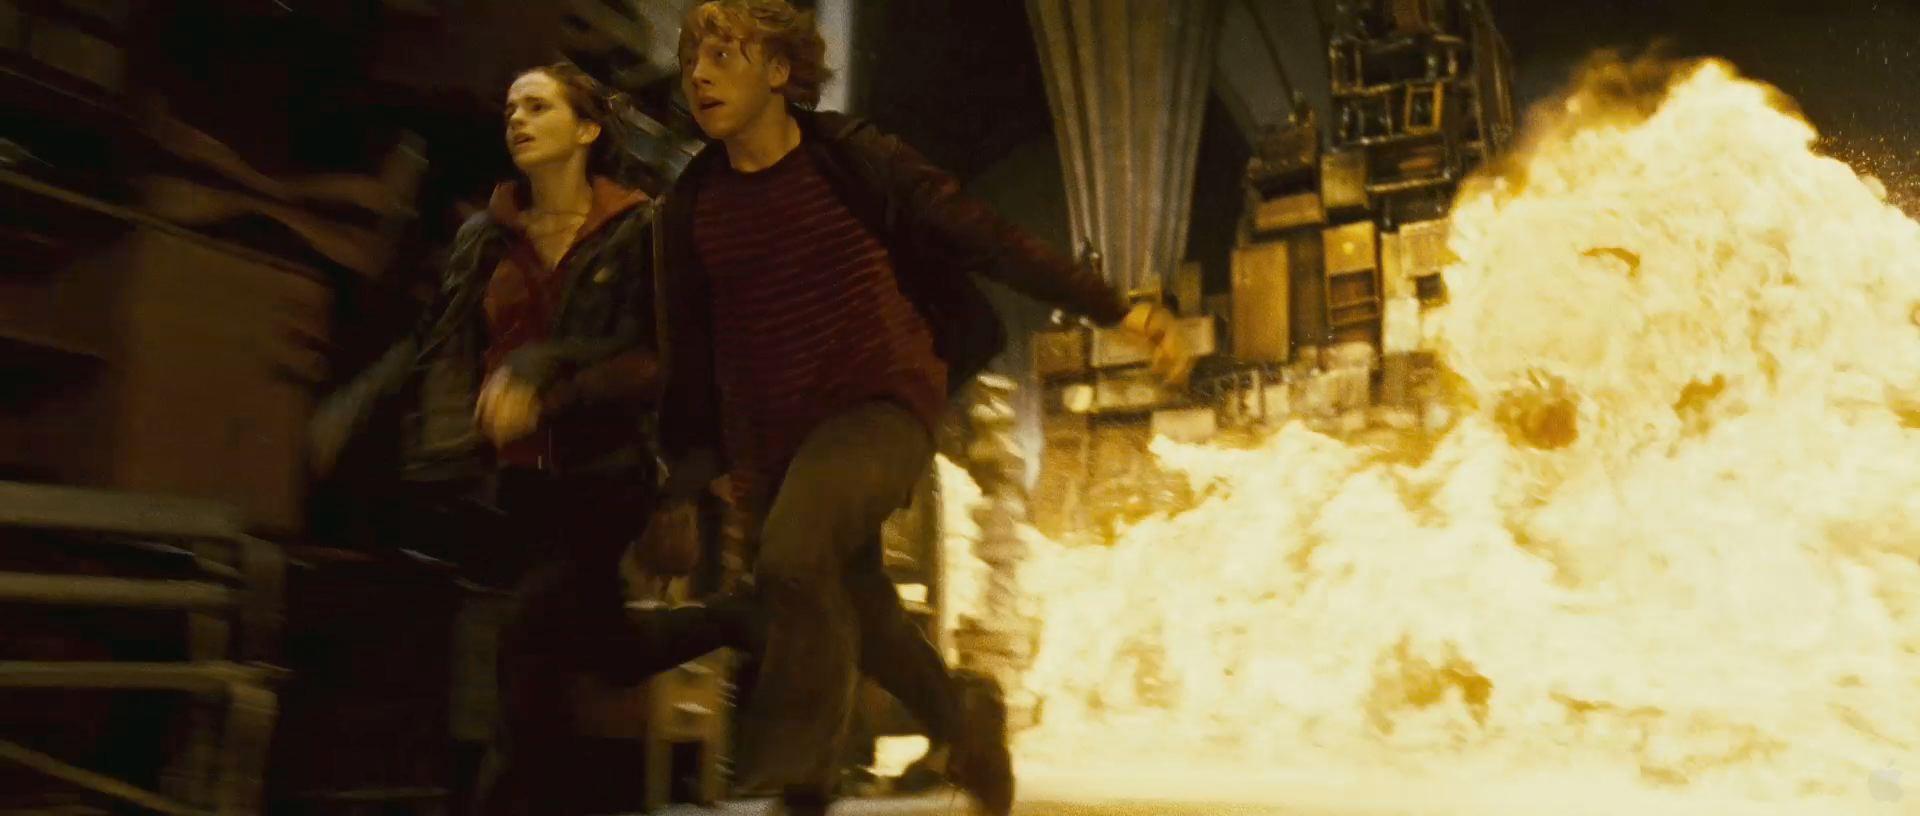 Harry Potter BlogHogwarts HP7 2 Trailer 67